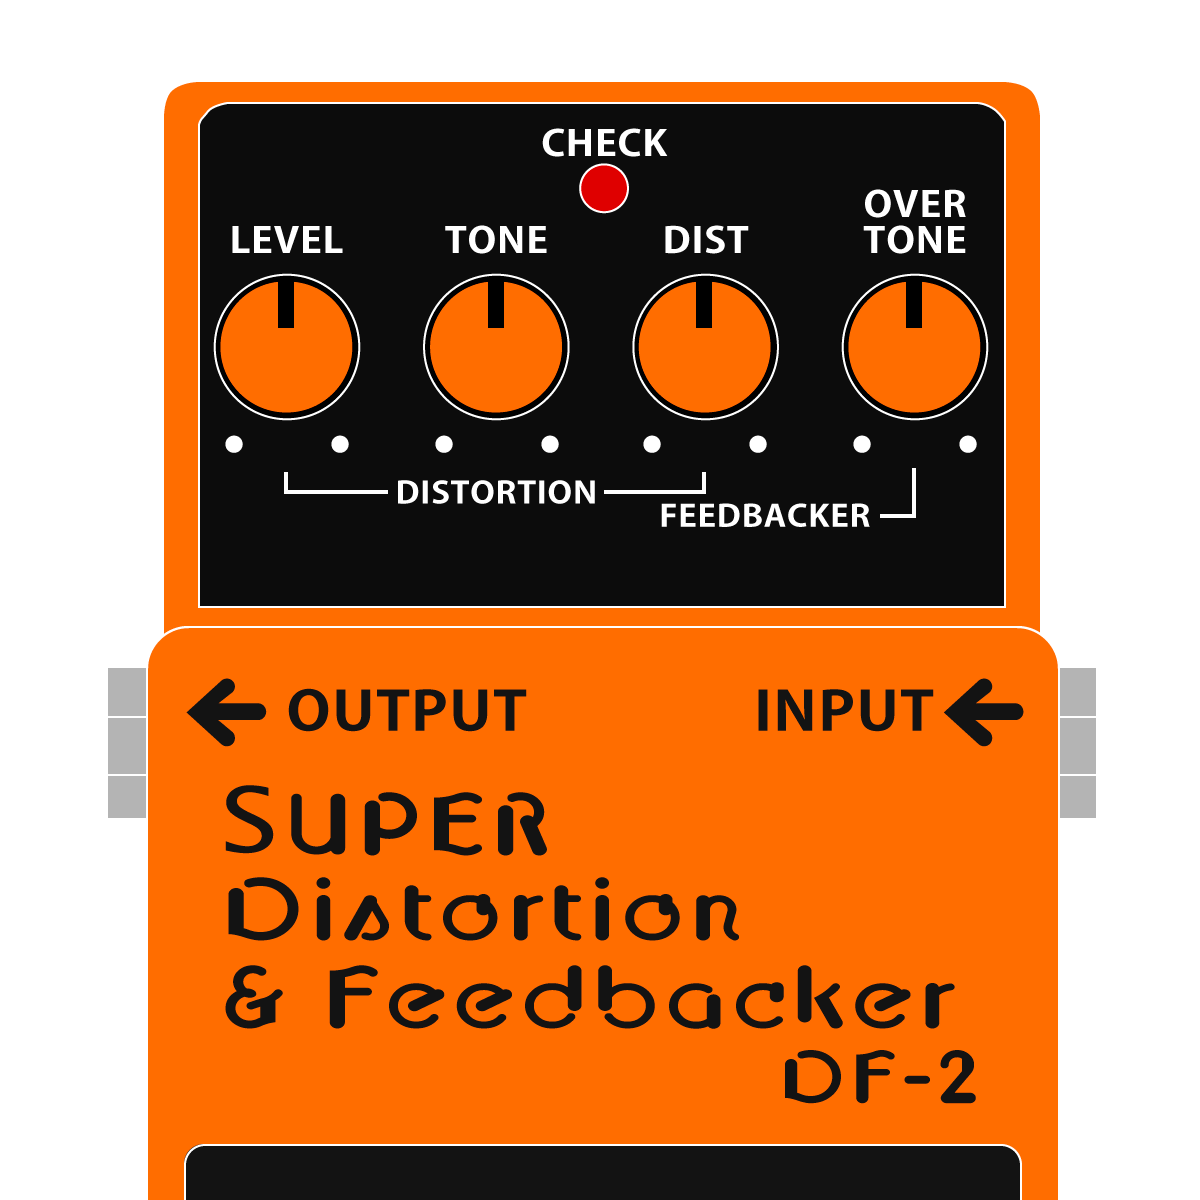 BOSS DF-2 SUPER Distortionr Feedbacker スーパーディストーション_フィードバッカーイラスト